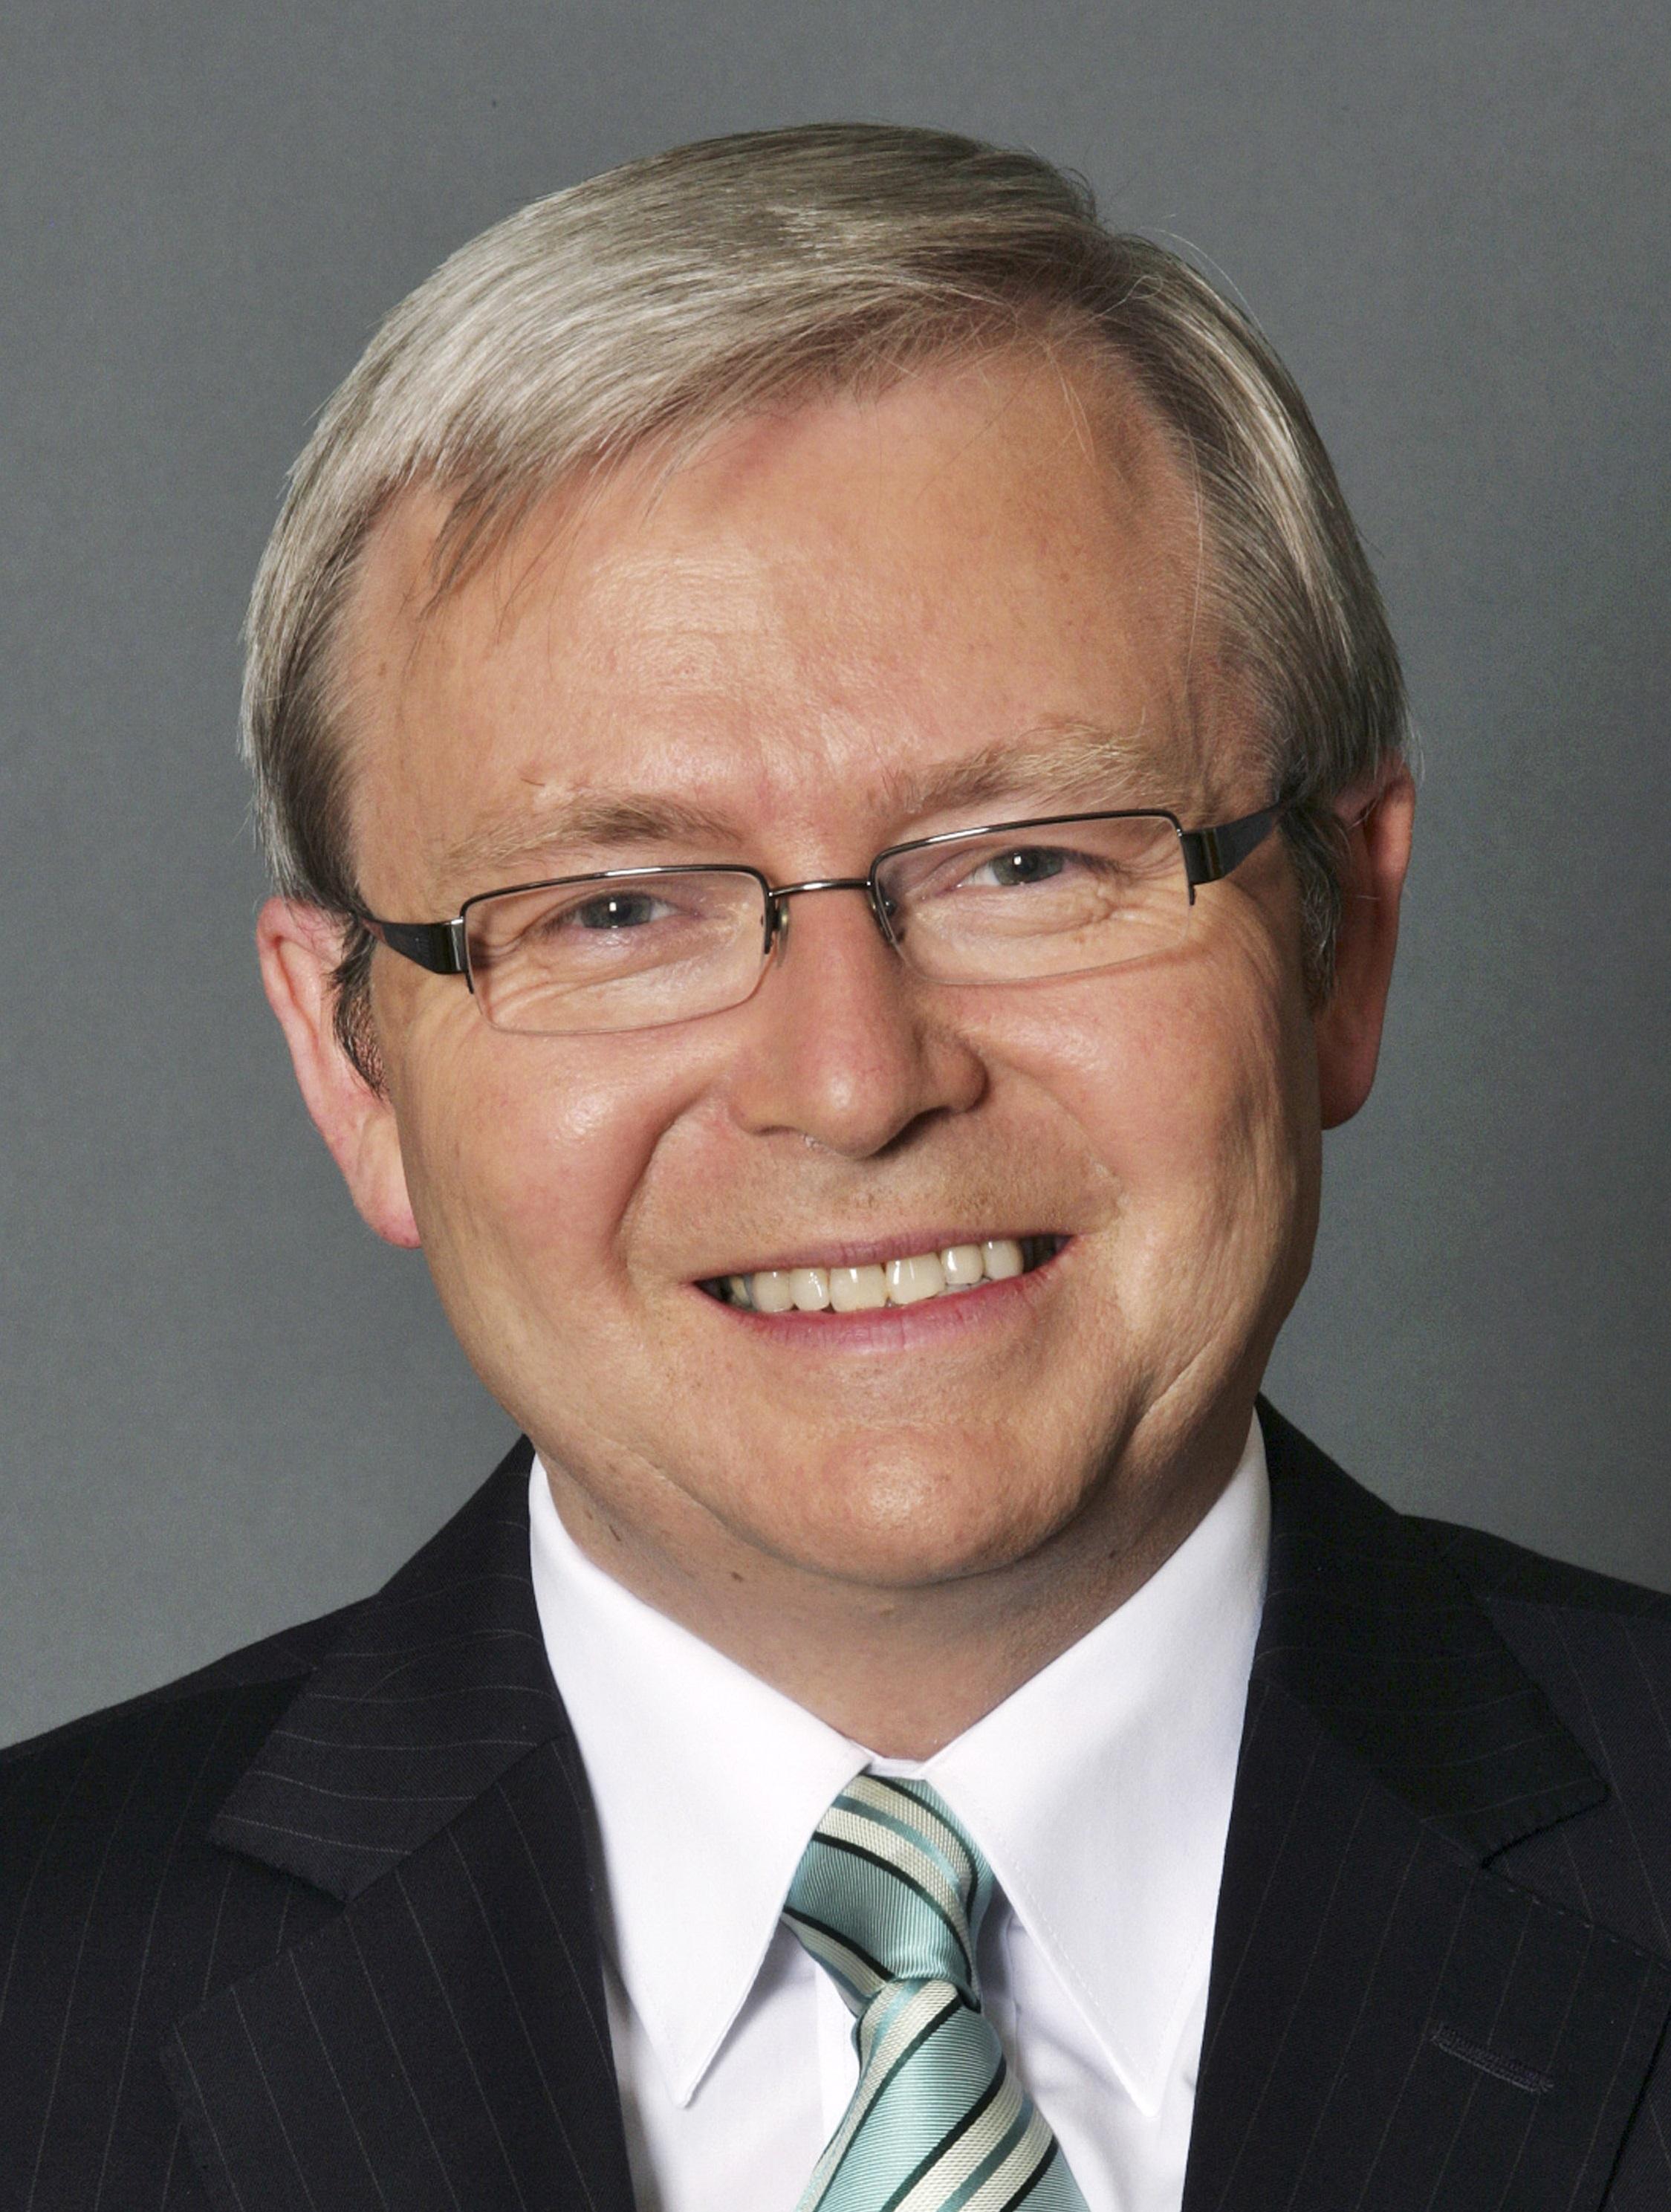 Kevin Rudd Wikipedia